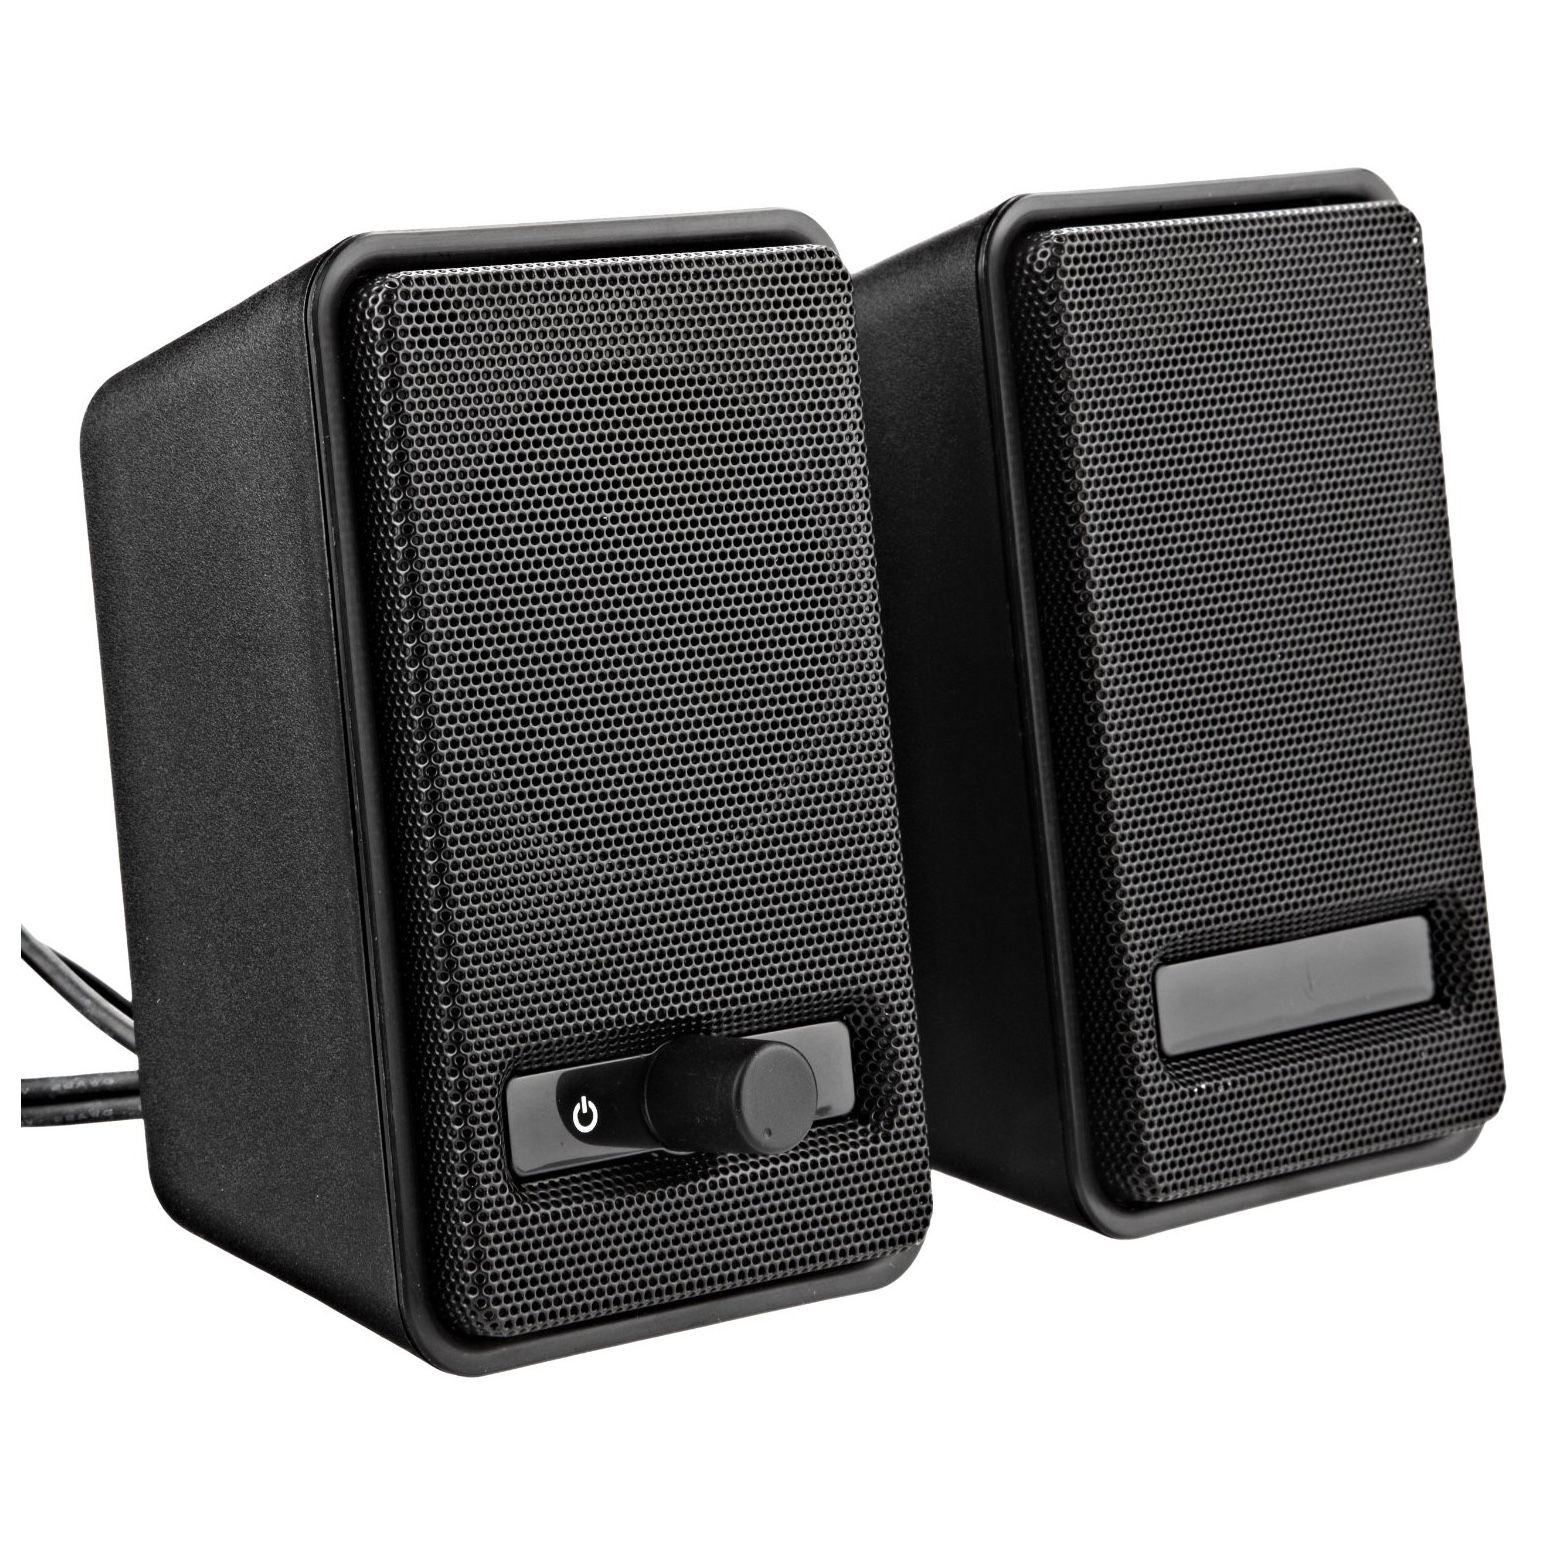 15 Best Desktop Computer Speakers Of 2018   Reviews Of PC Speakers For  Computers